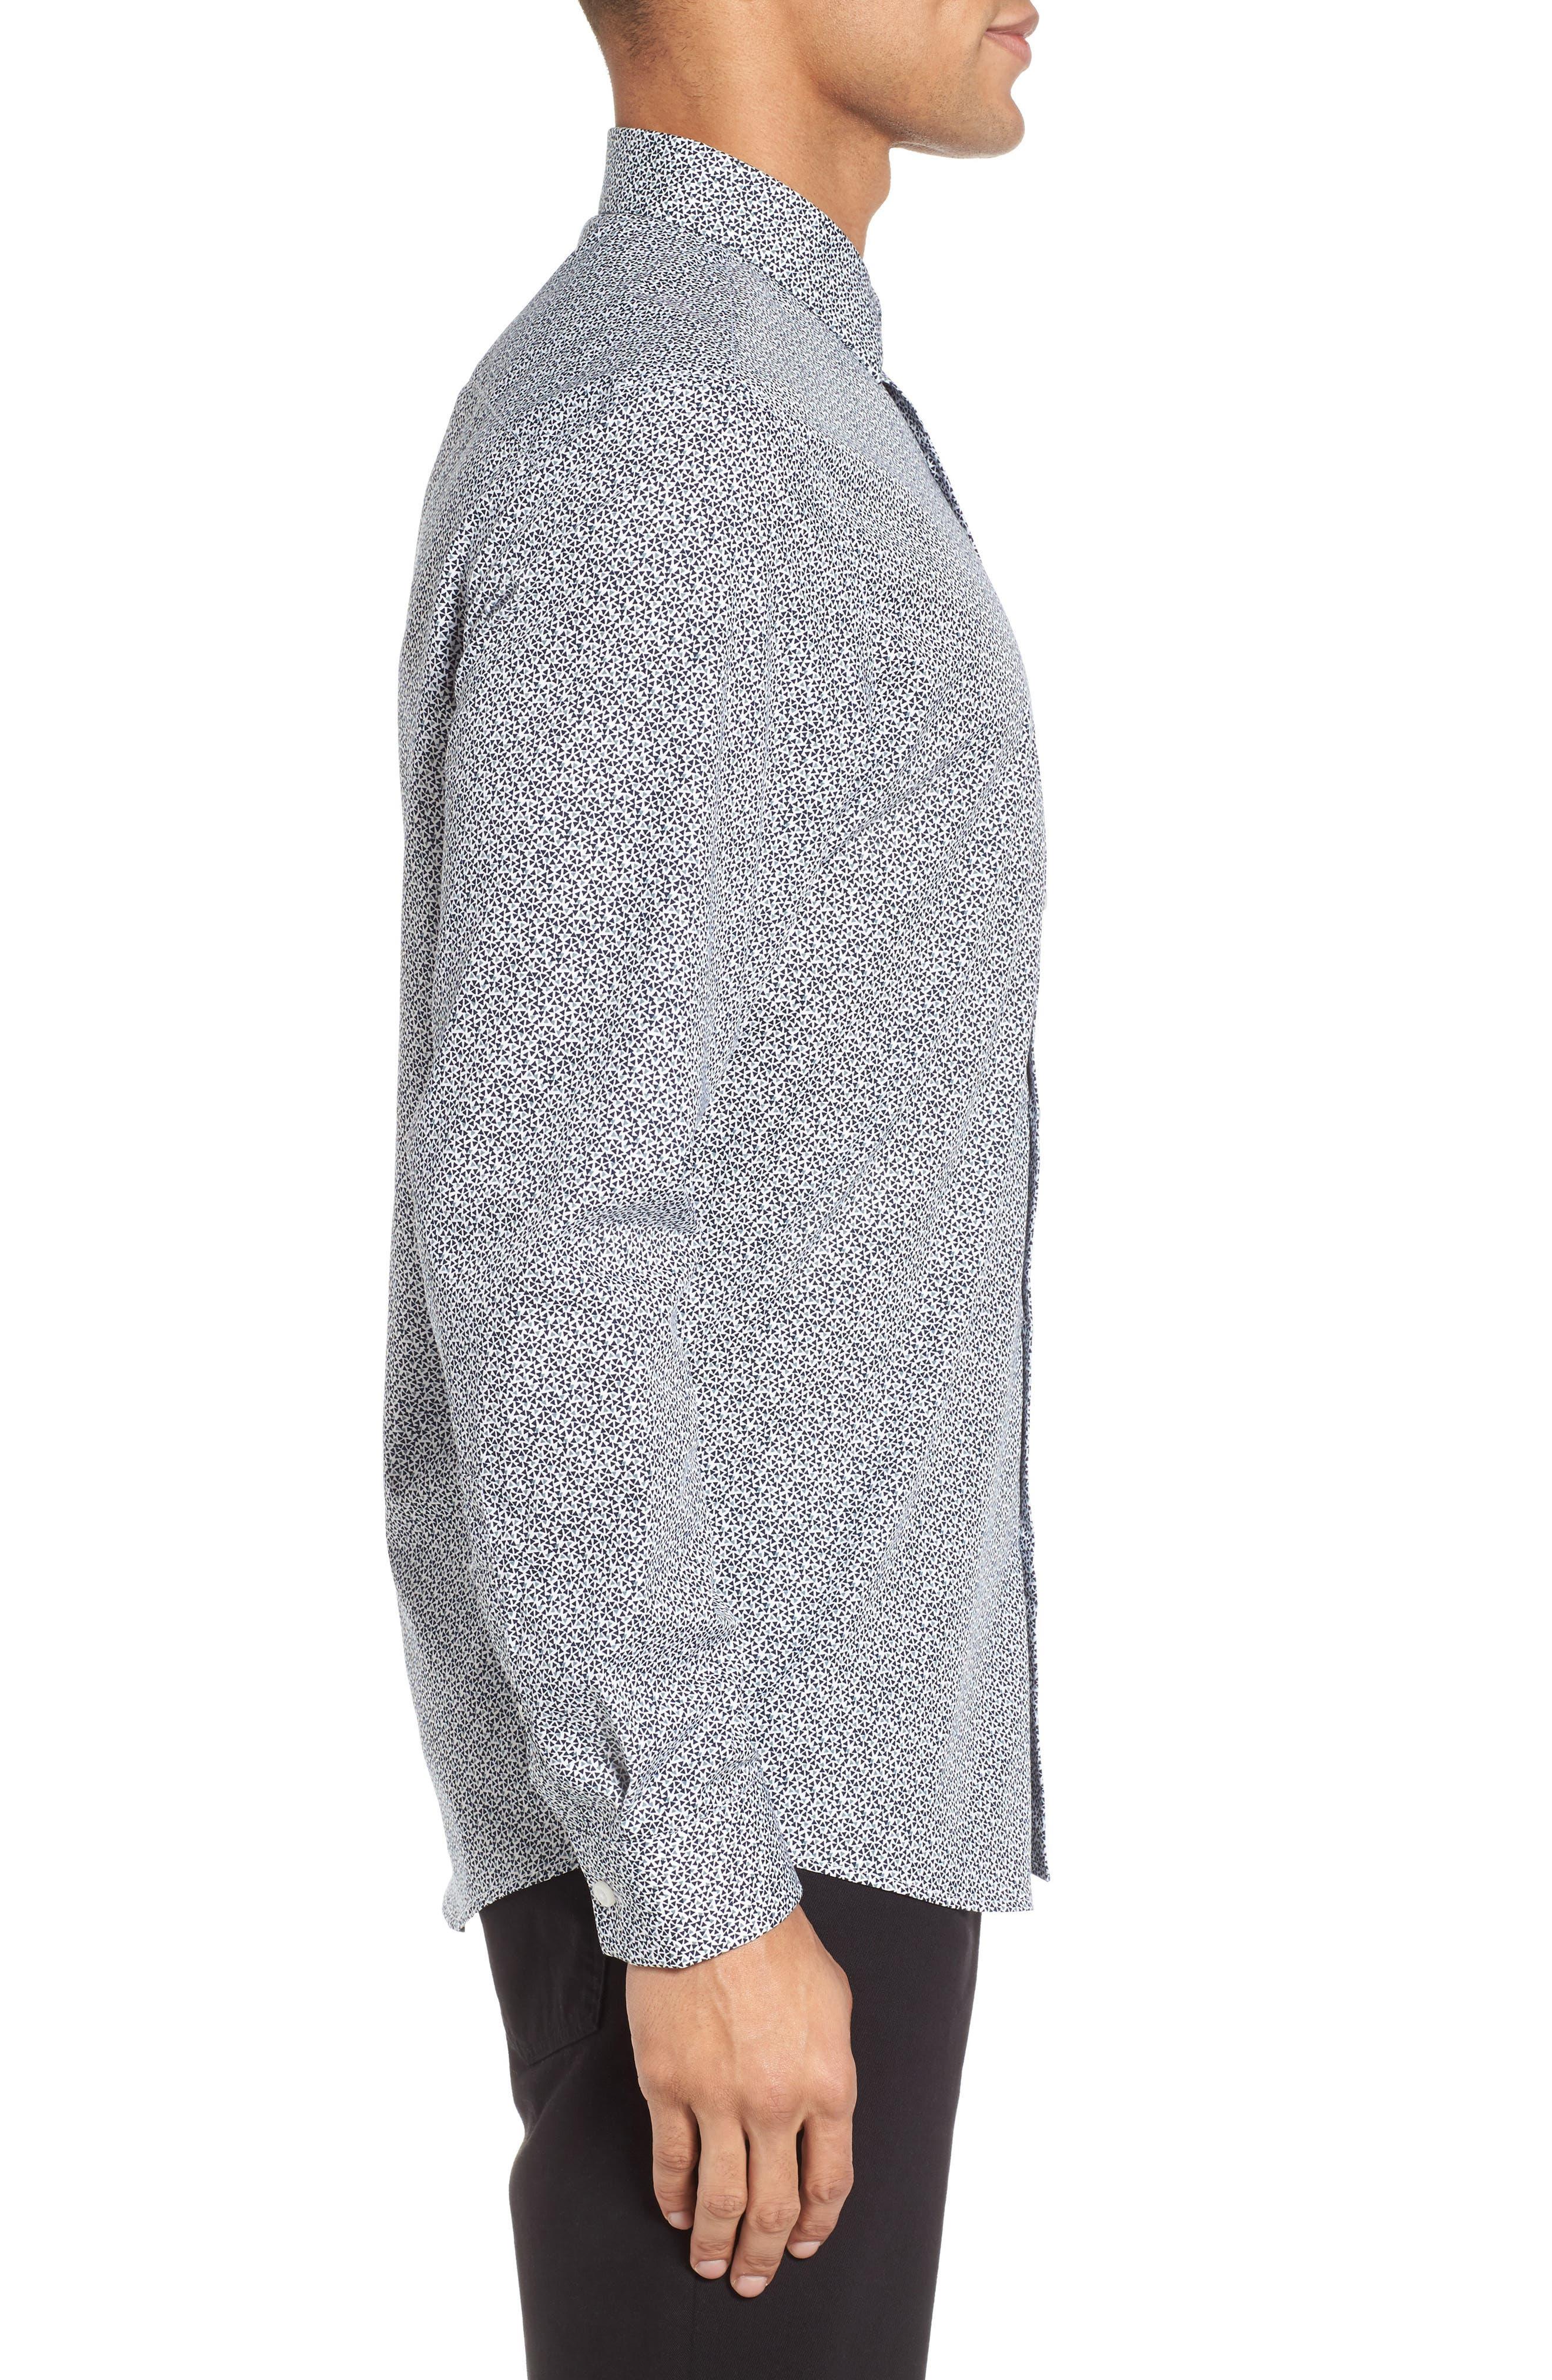 Trim Fit Geometric Sport Shirt,                             Alternate thumbnail 4, color,                             Navy Blue Scatter Triangles